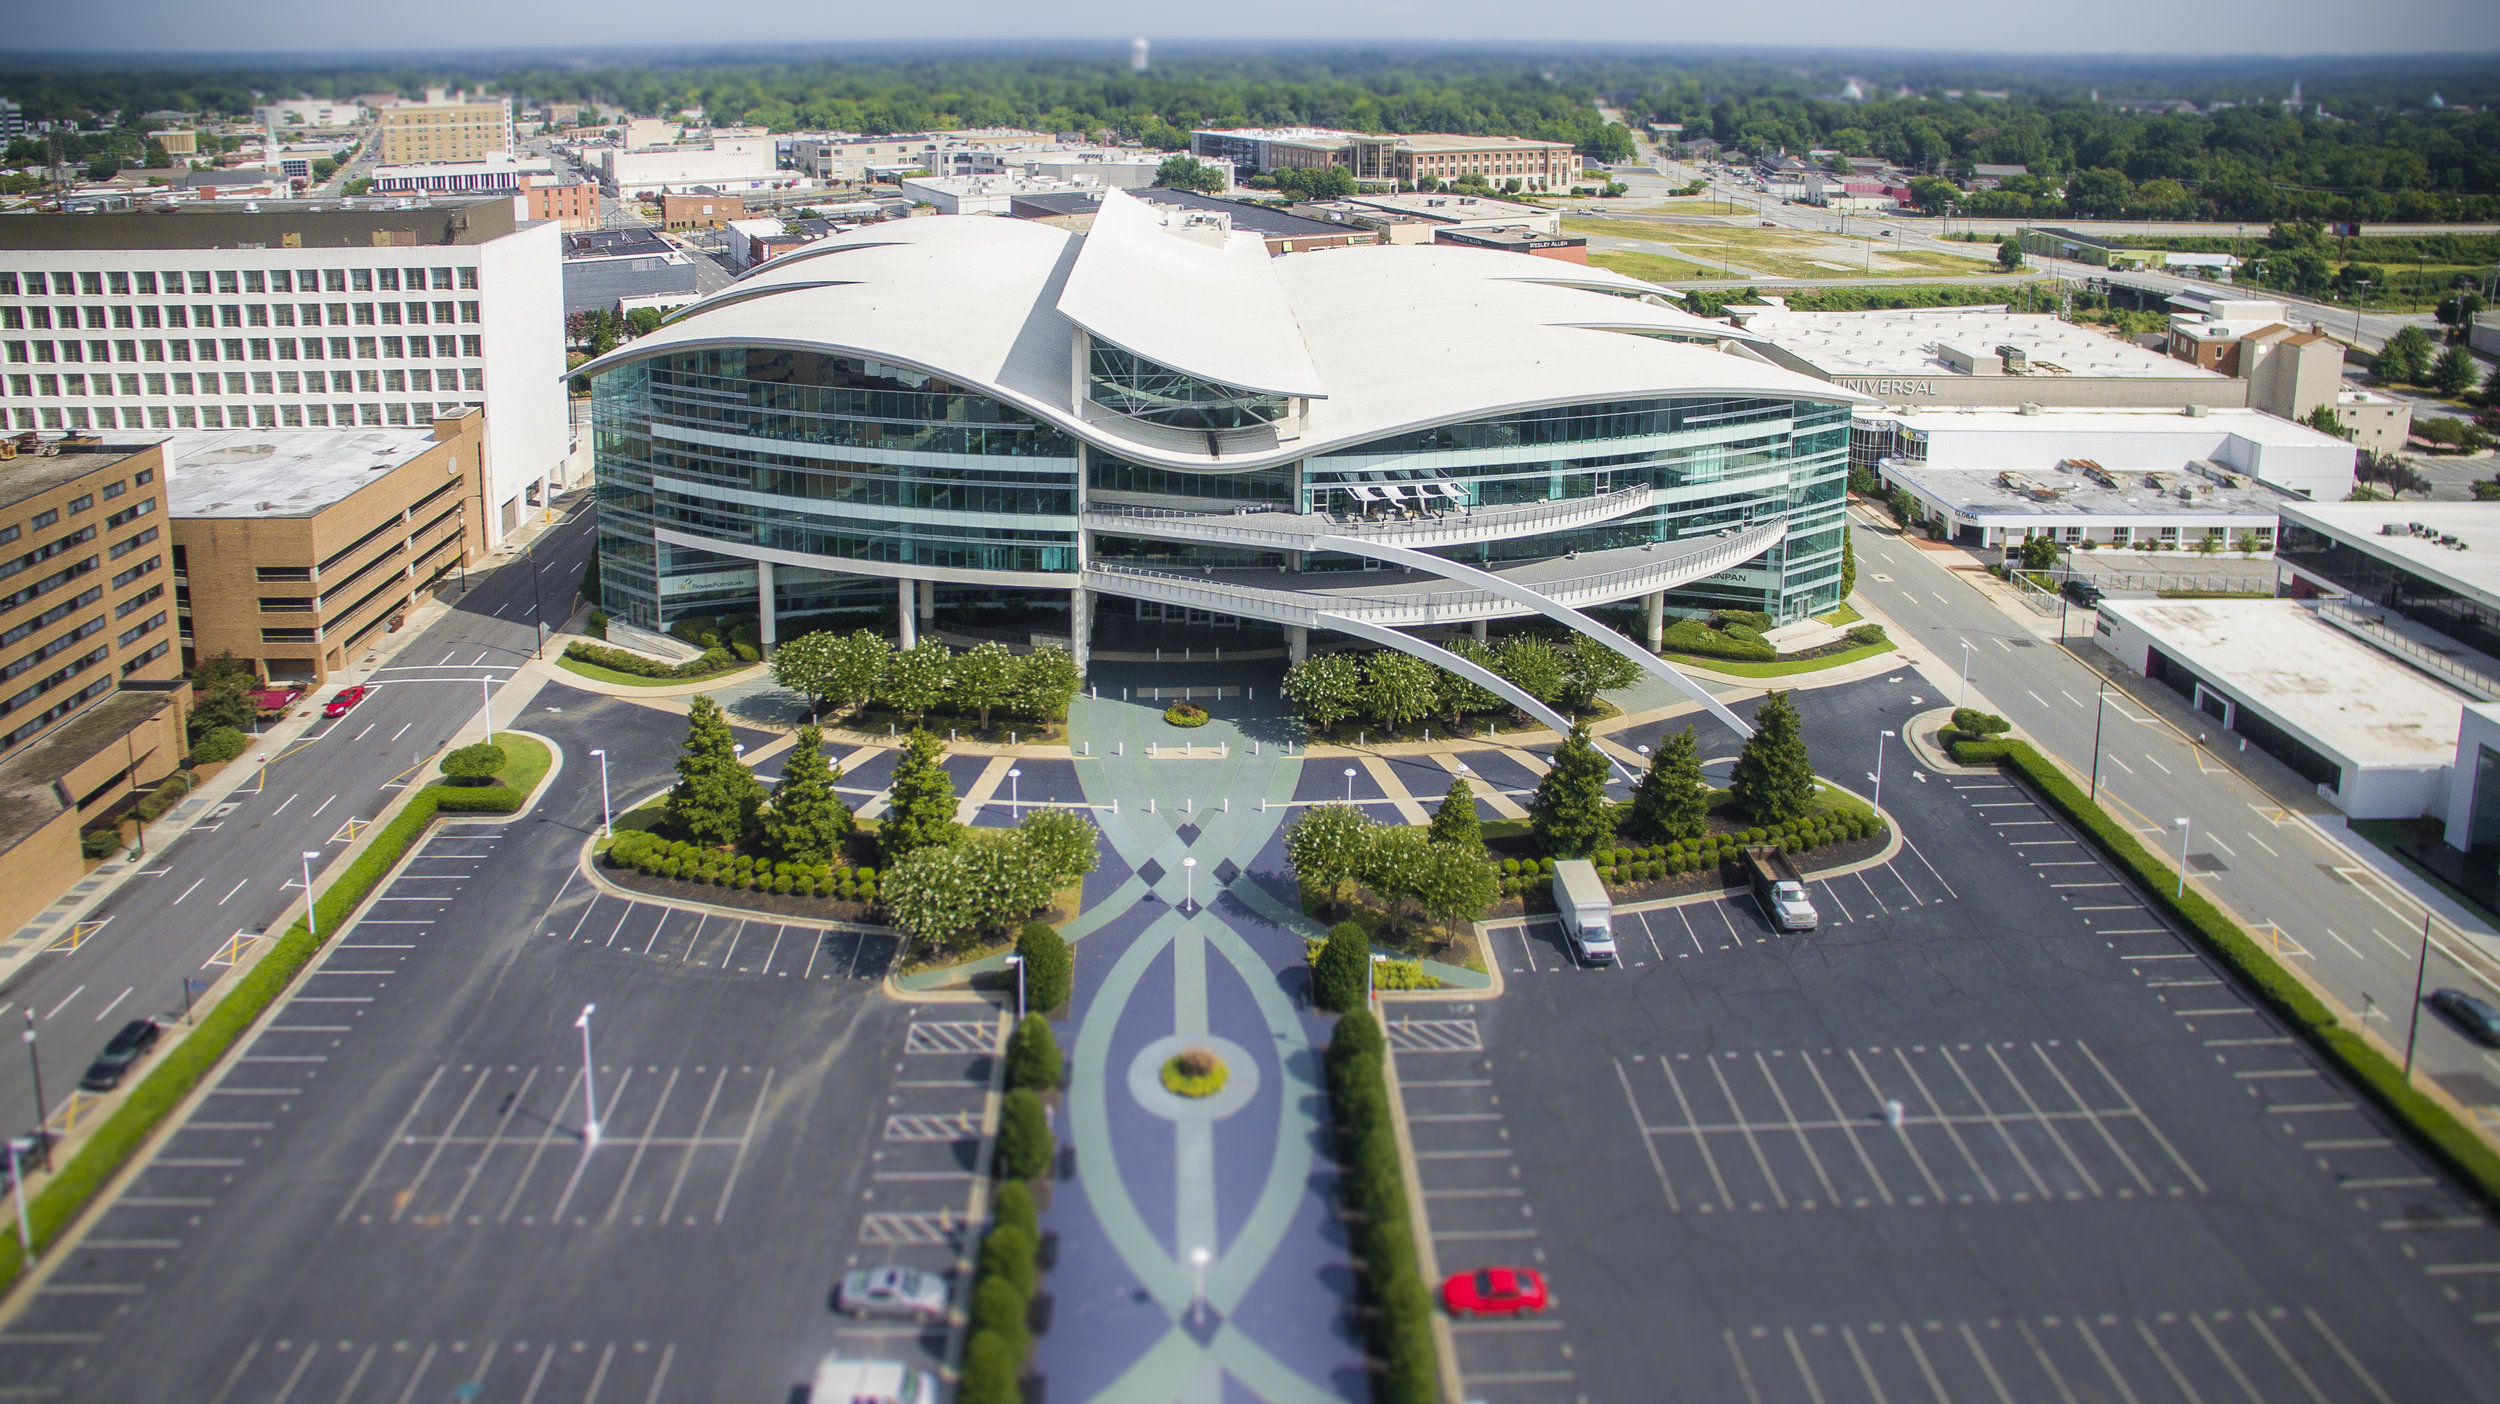 real-estate-photography-drone-photographer-drone-greensboro-nc-triad-218.jpg